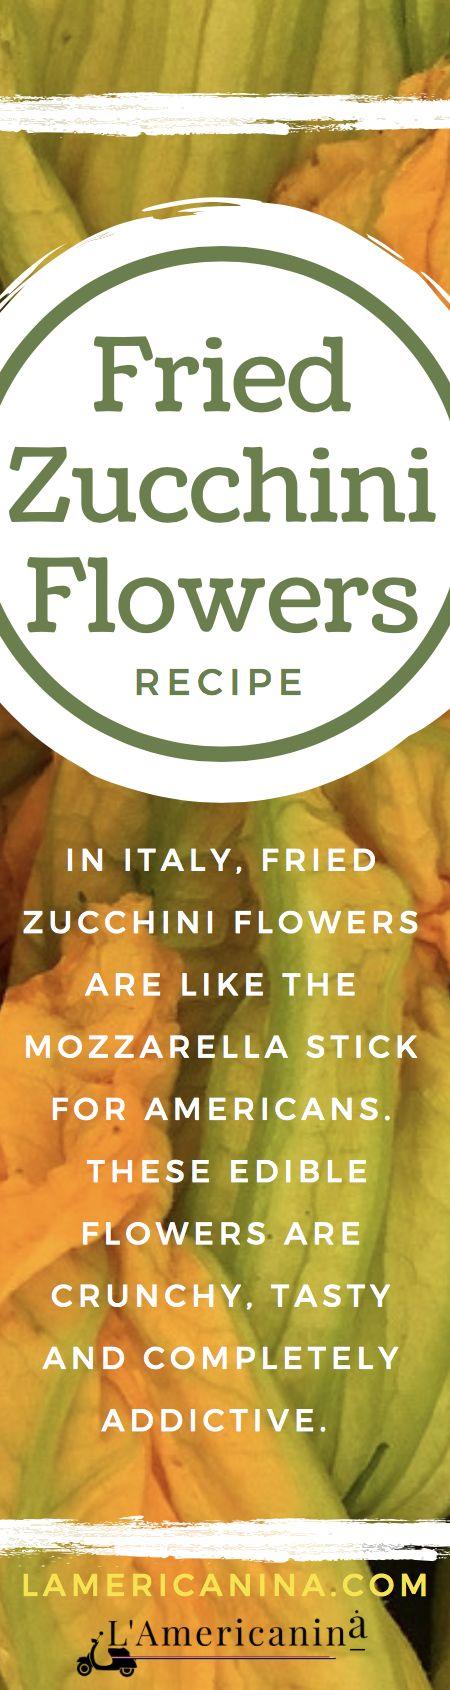 Recipe, Healthy, Vegetables, Zucchini Flowers, Fritti, Fried, side dish, Italian food.